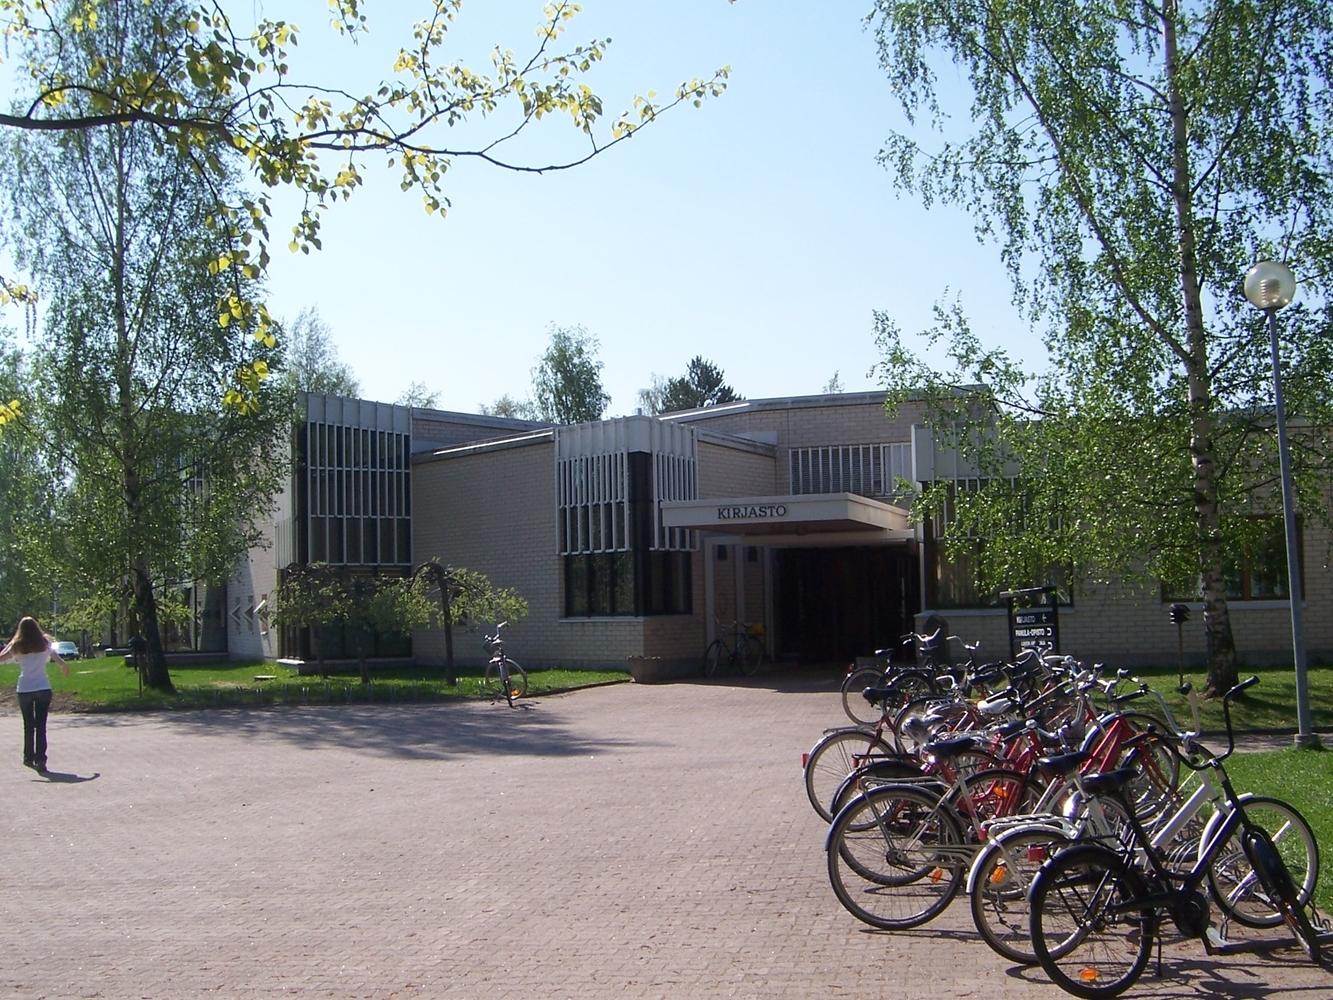 Kauhajoki Main library